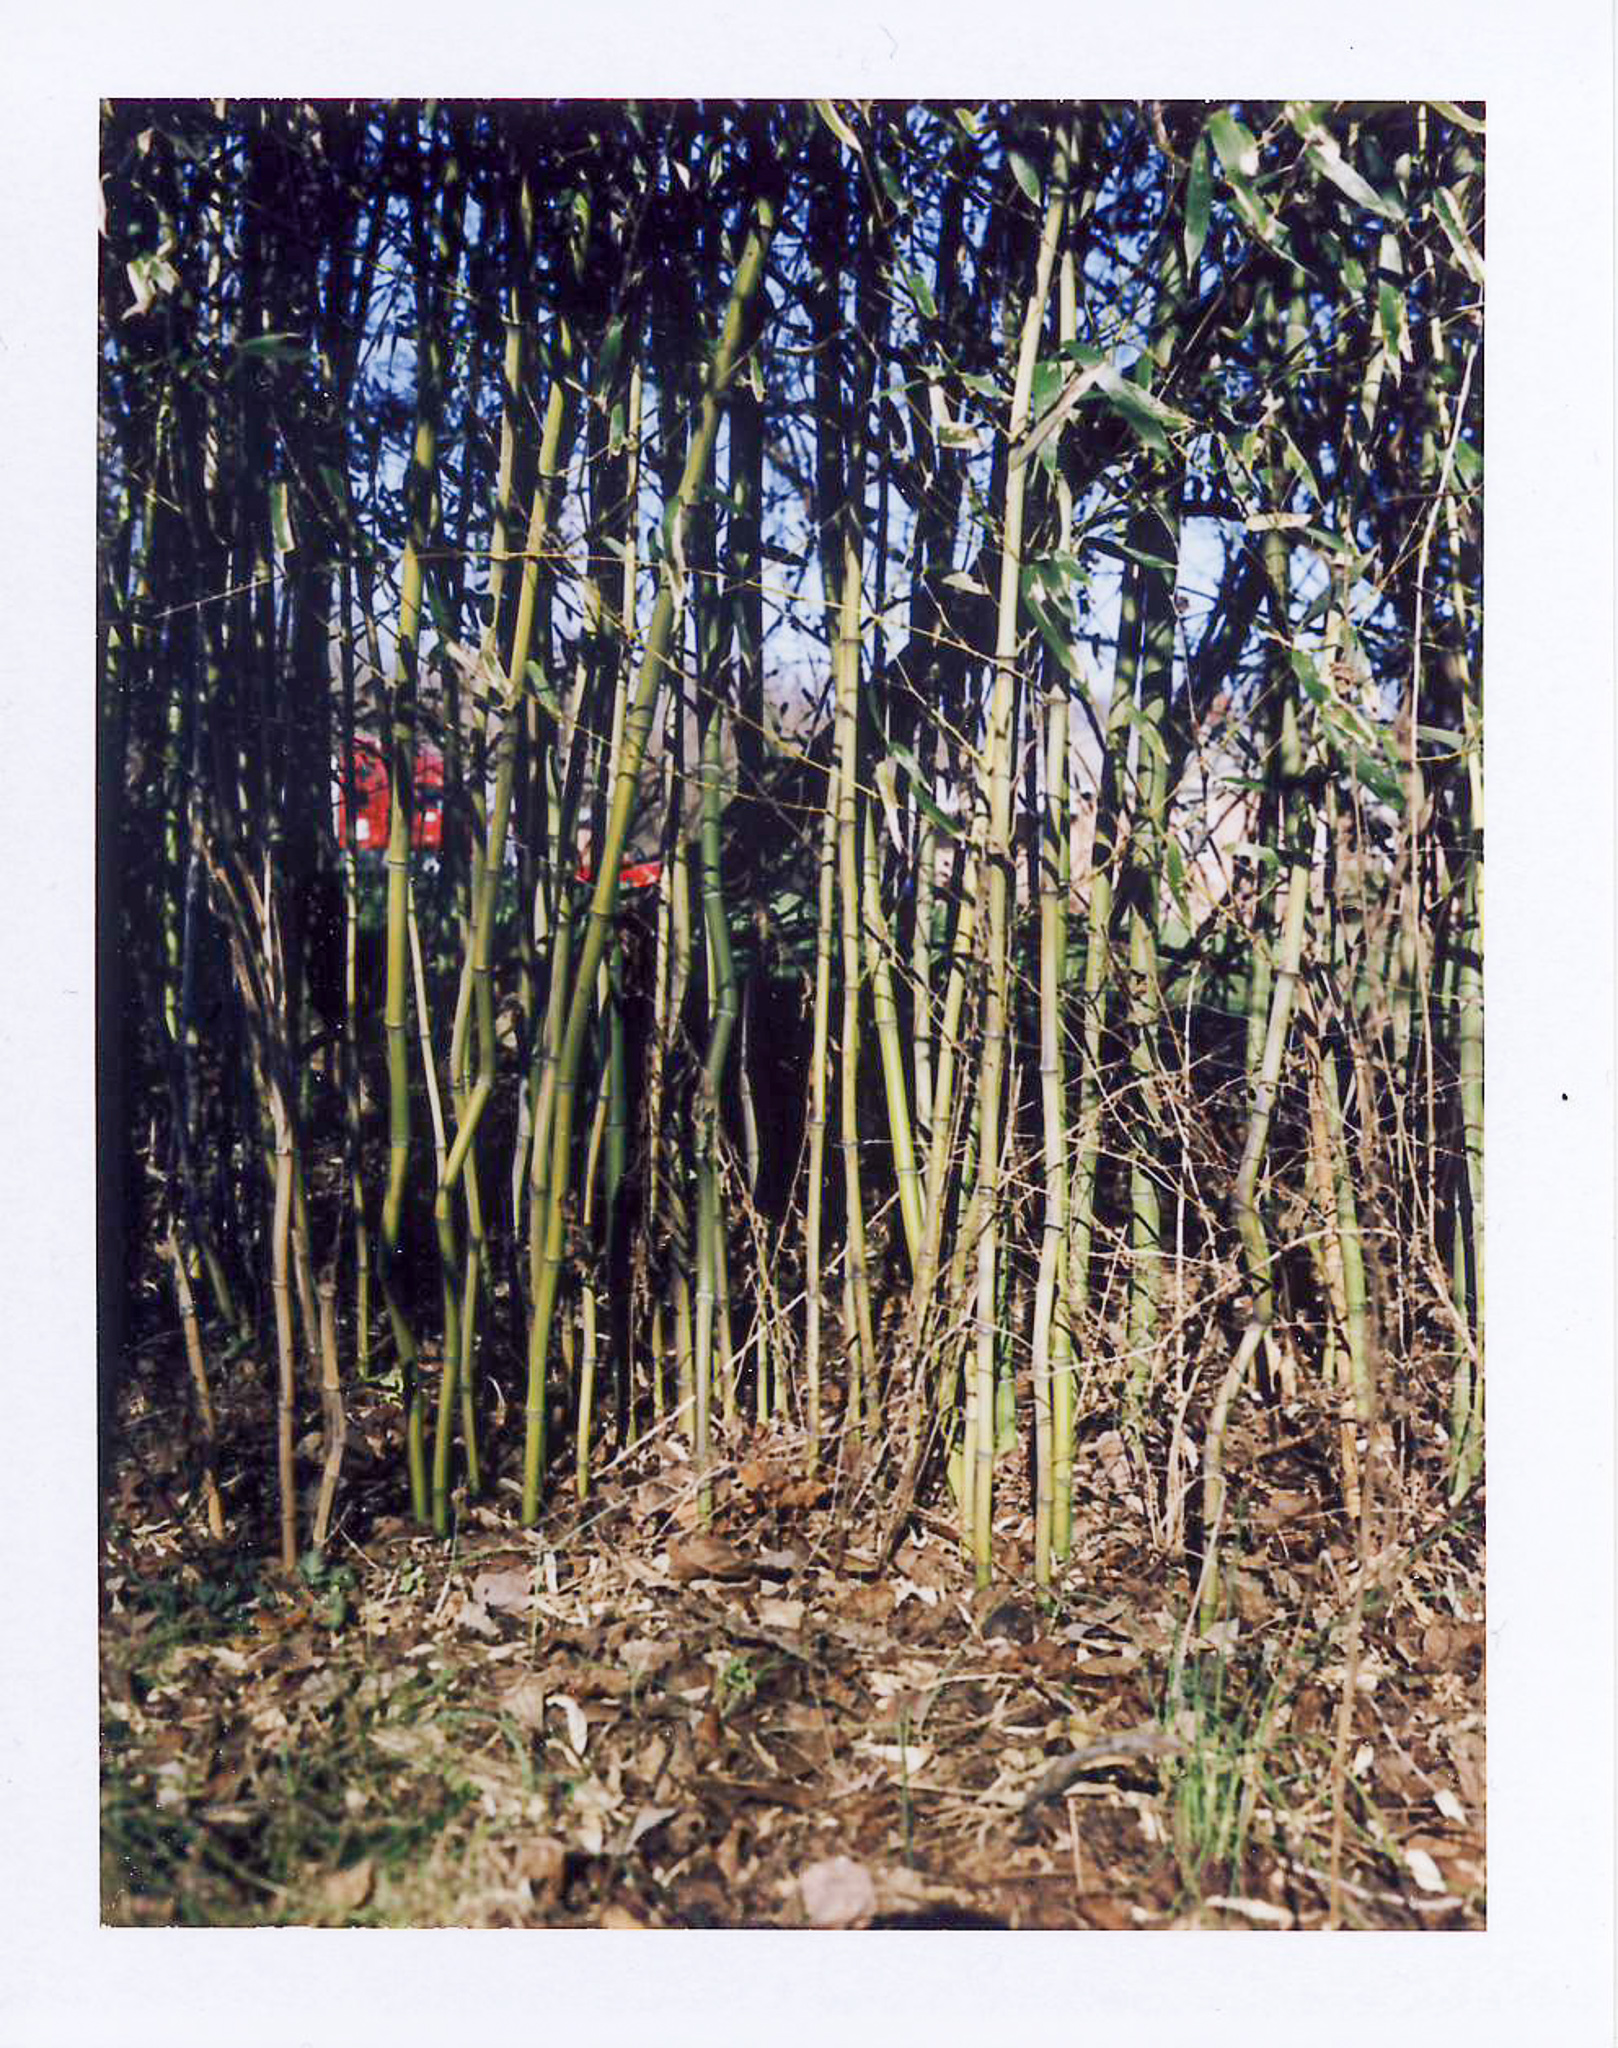 105 Bamboo.jpg